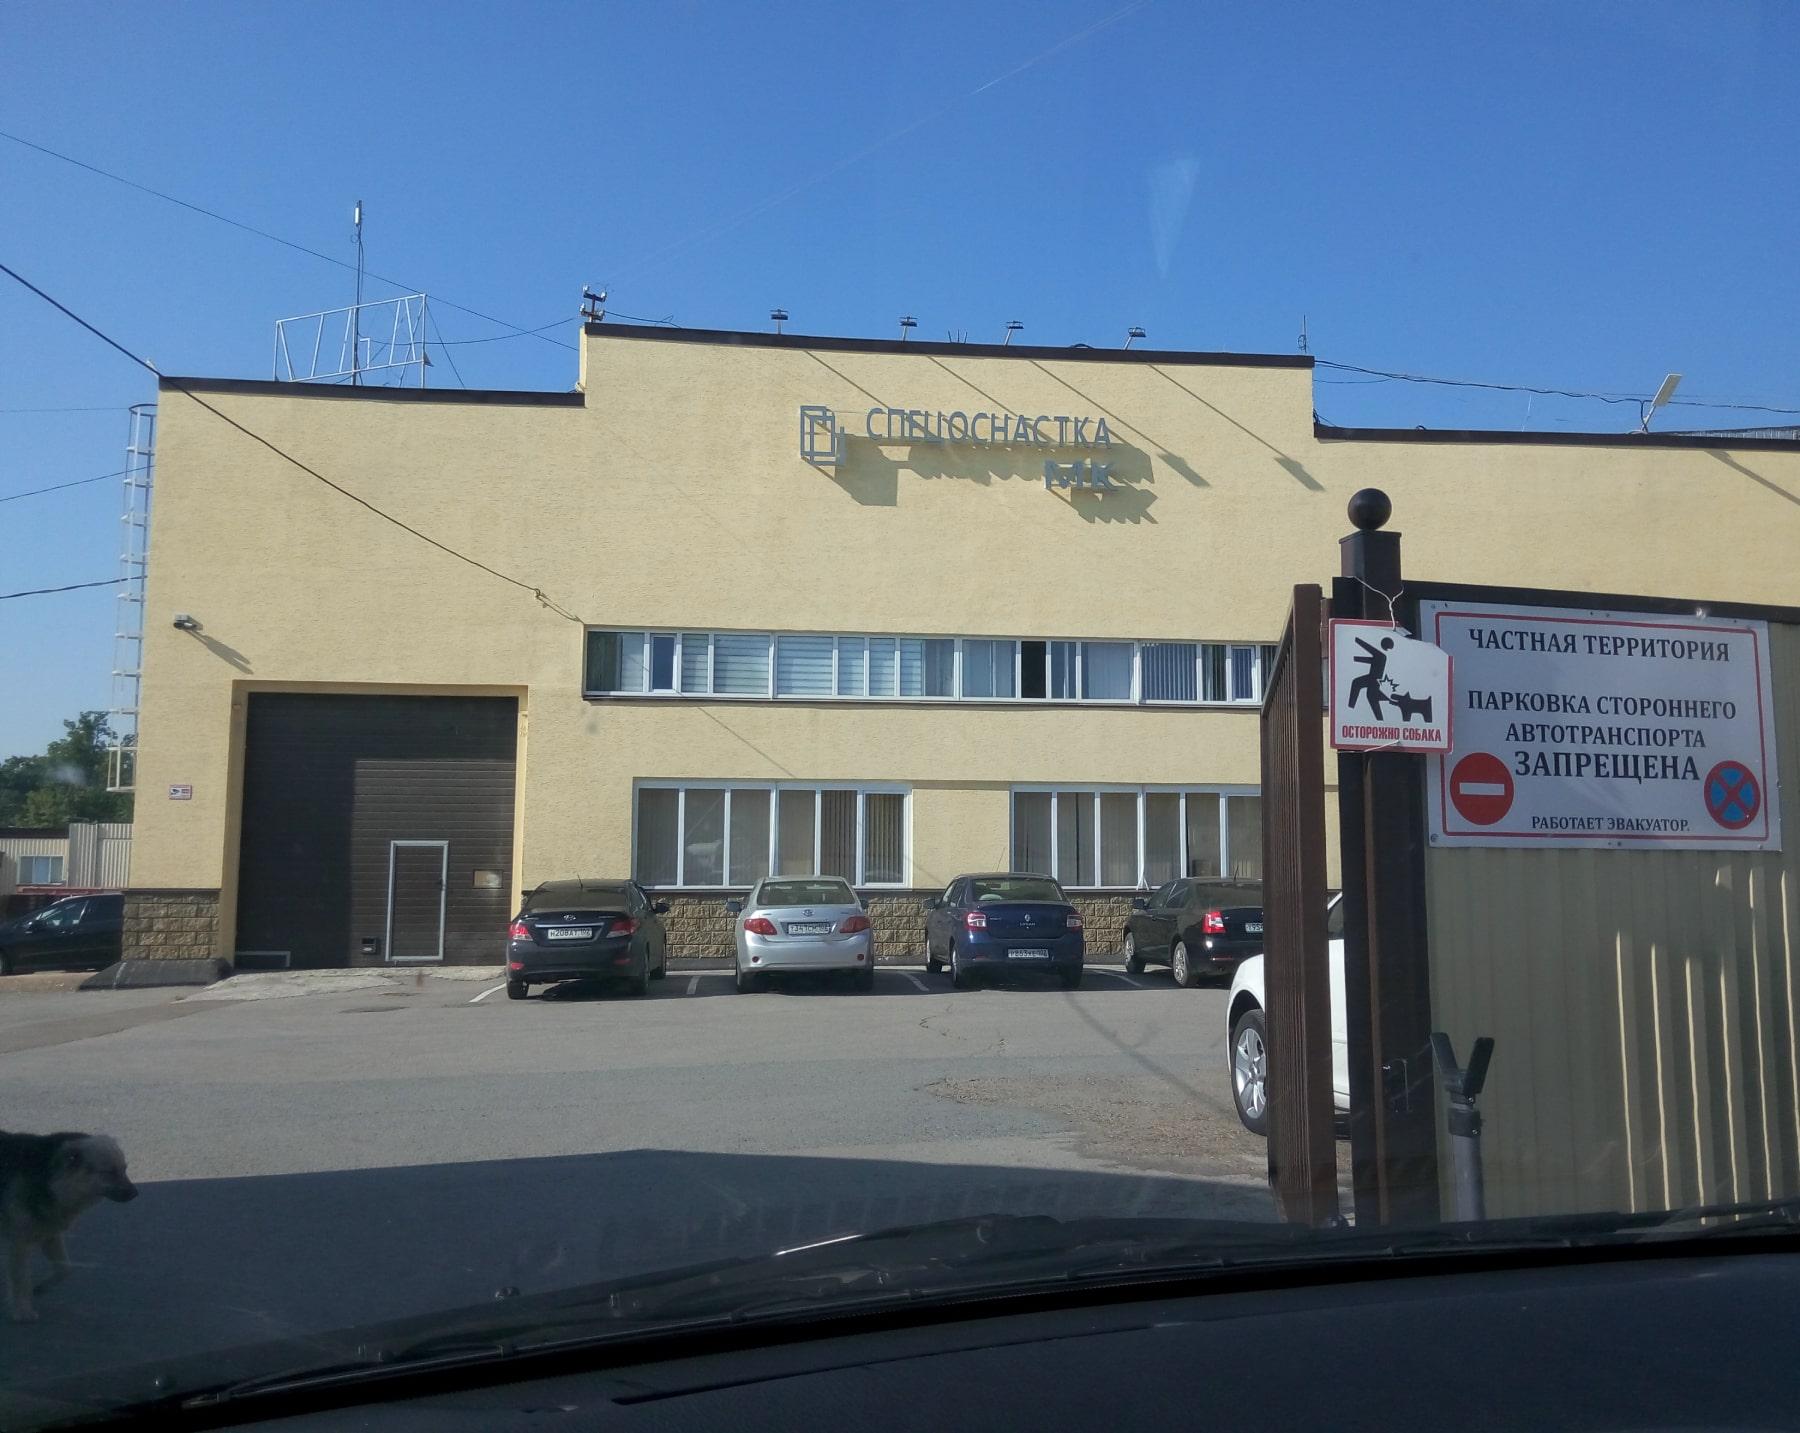 Фото завода Центр эрозионных технологий им. Лазаренко